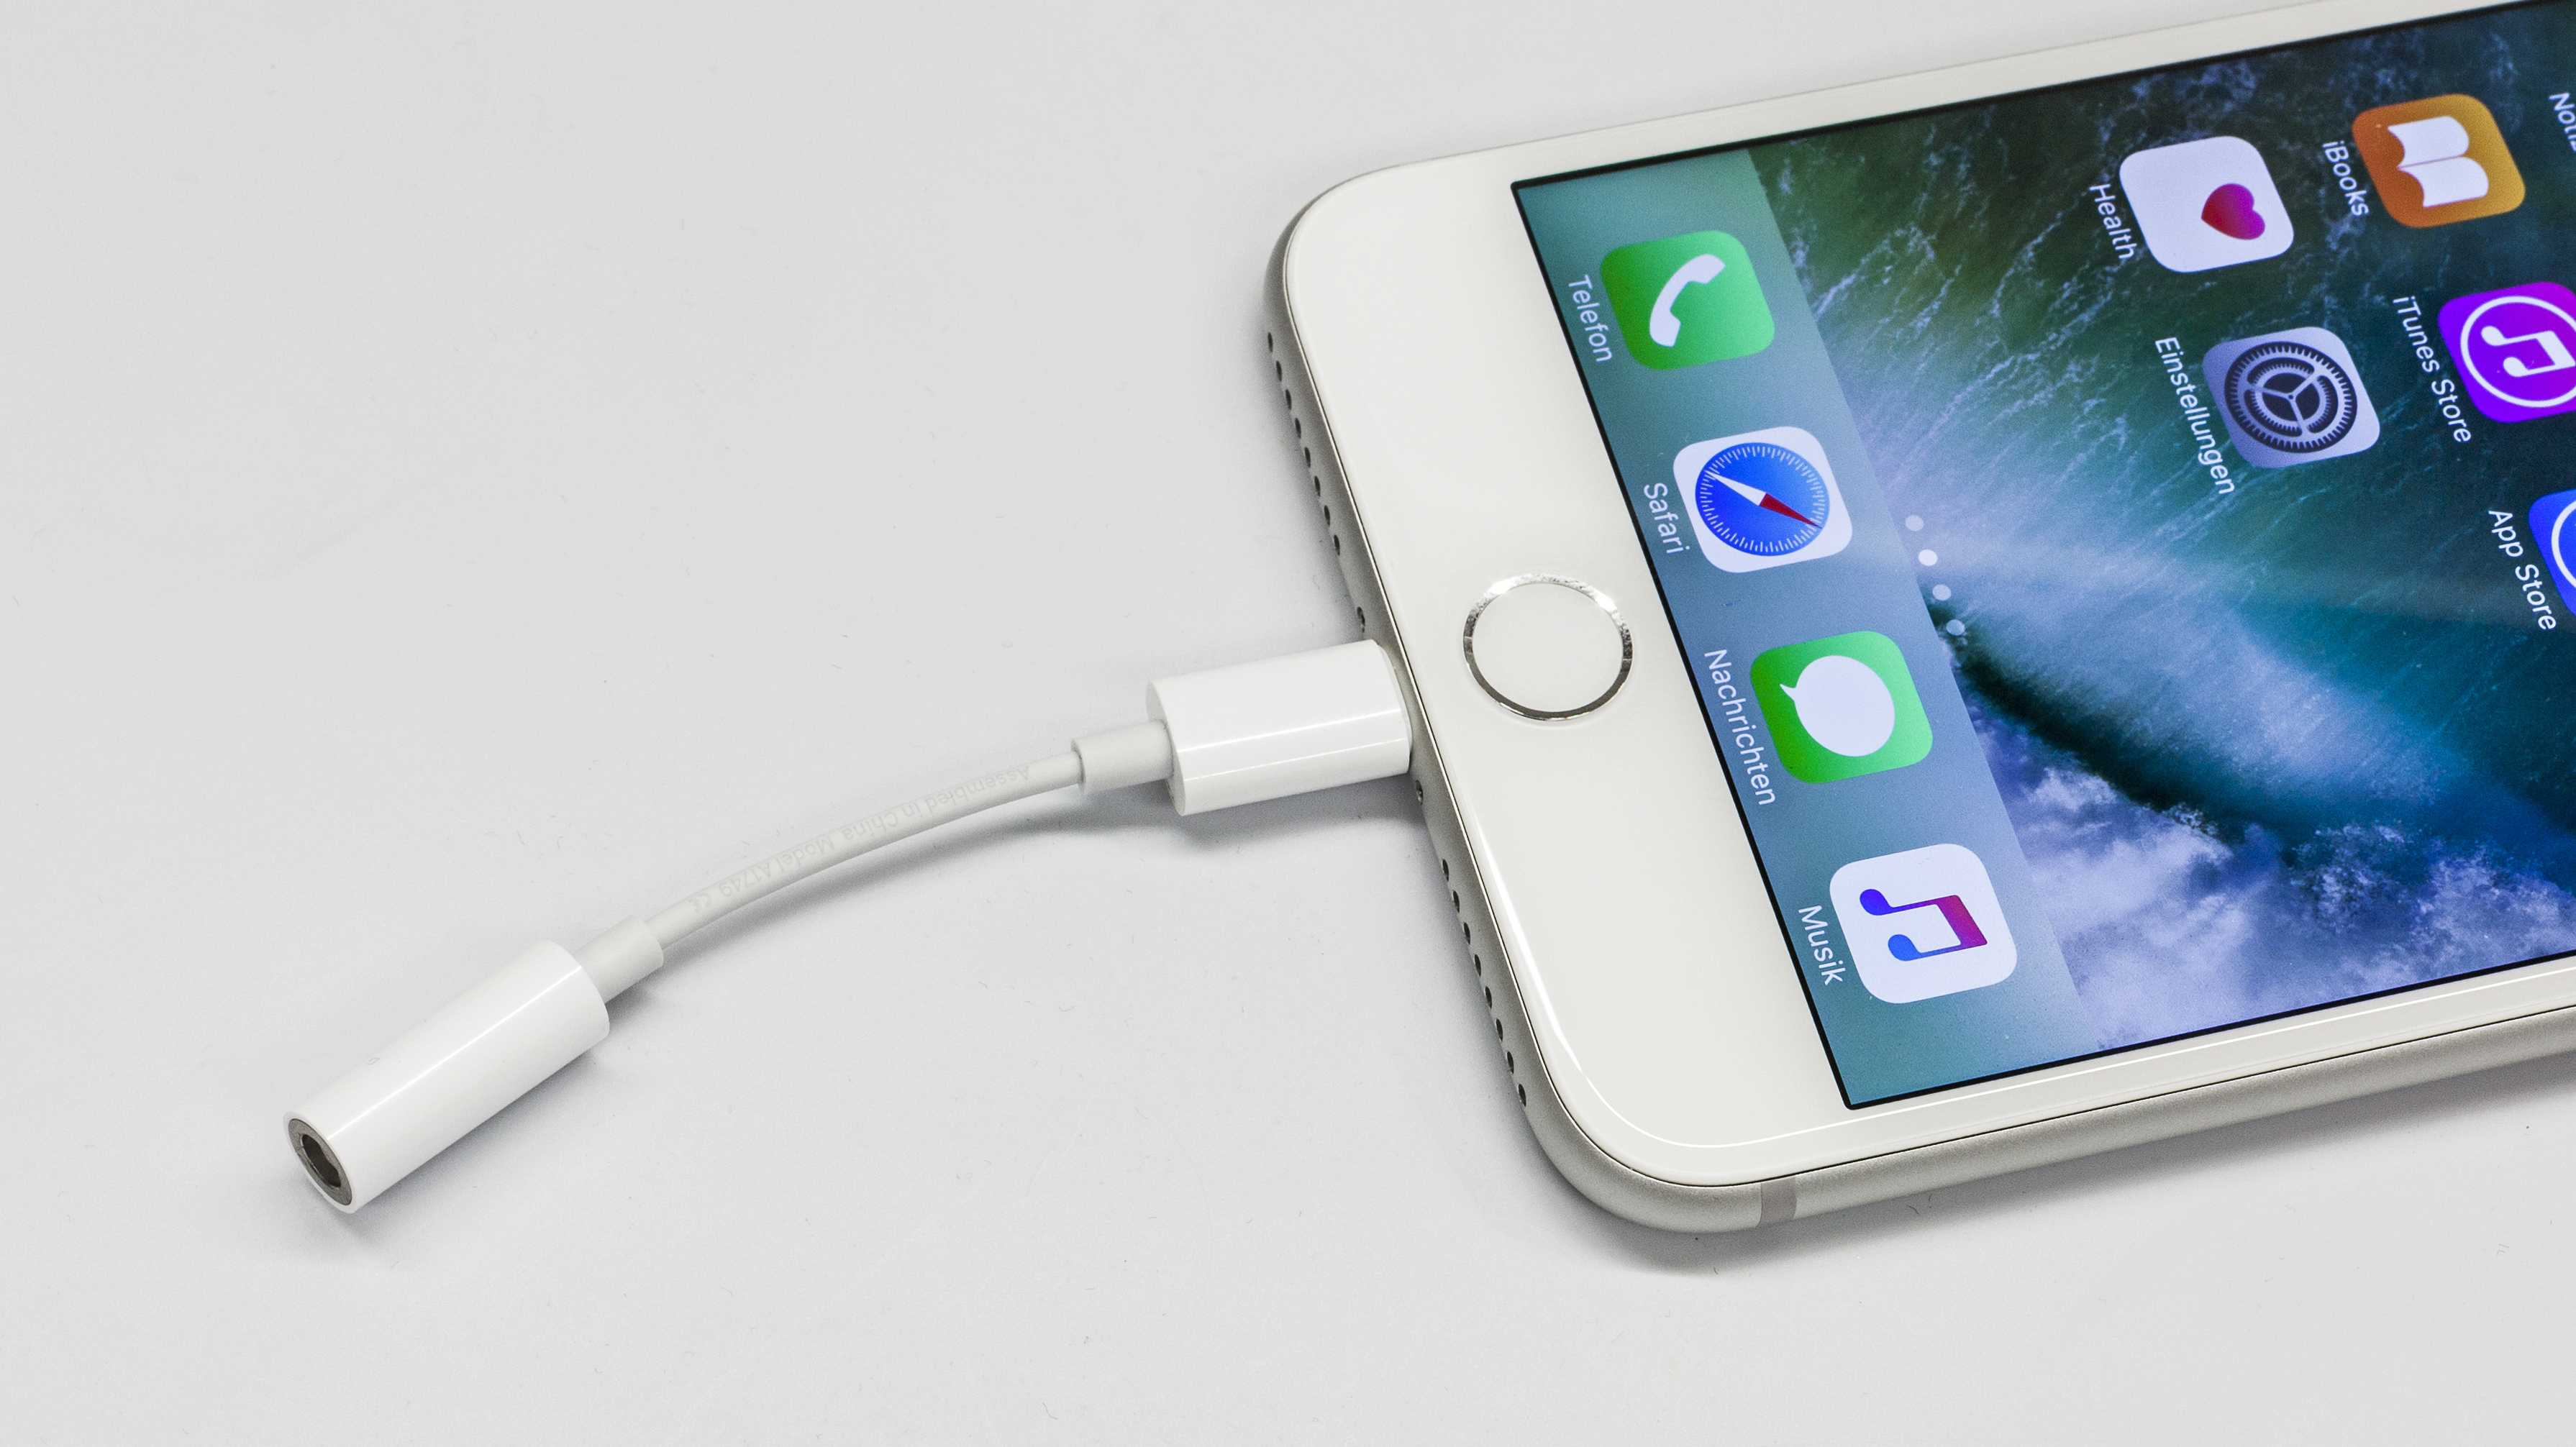 iPhone 7 nachgemessen: Audio-Adapter liefert schlechteren Sound